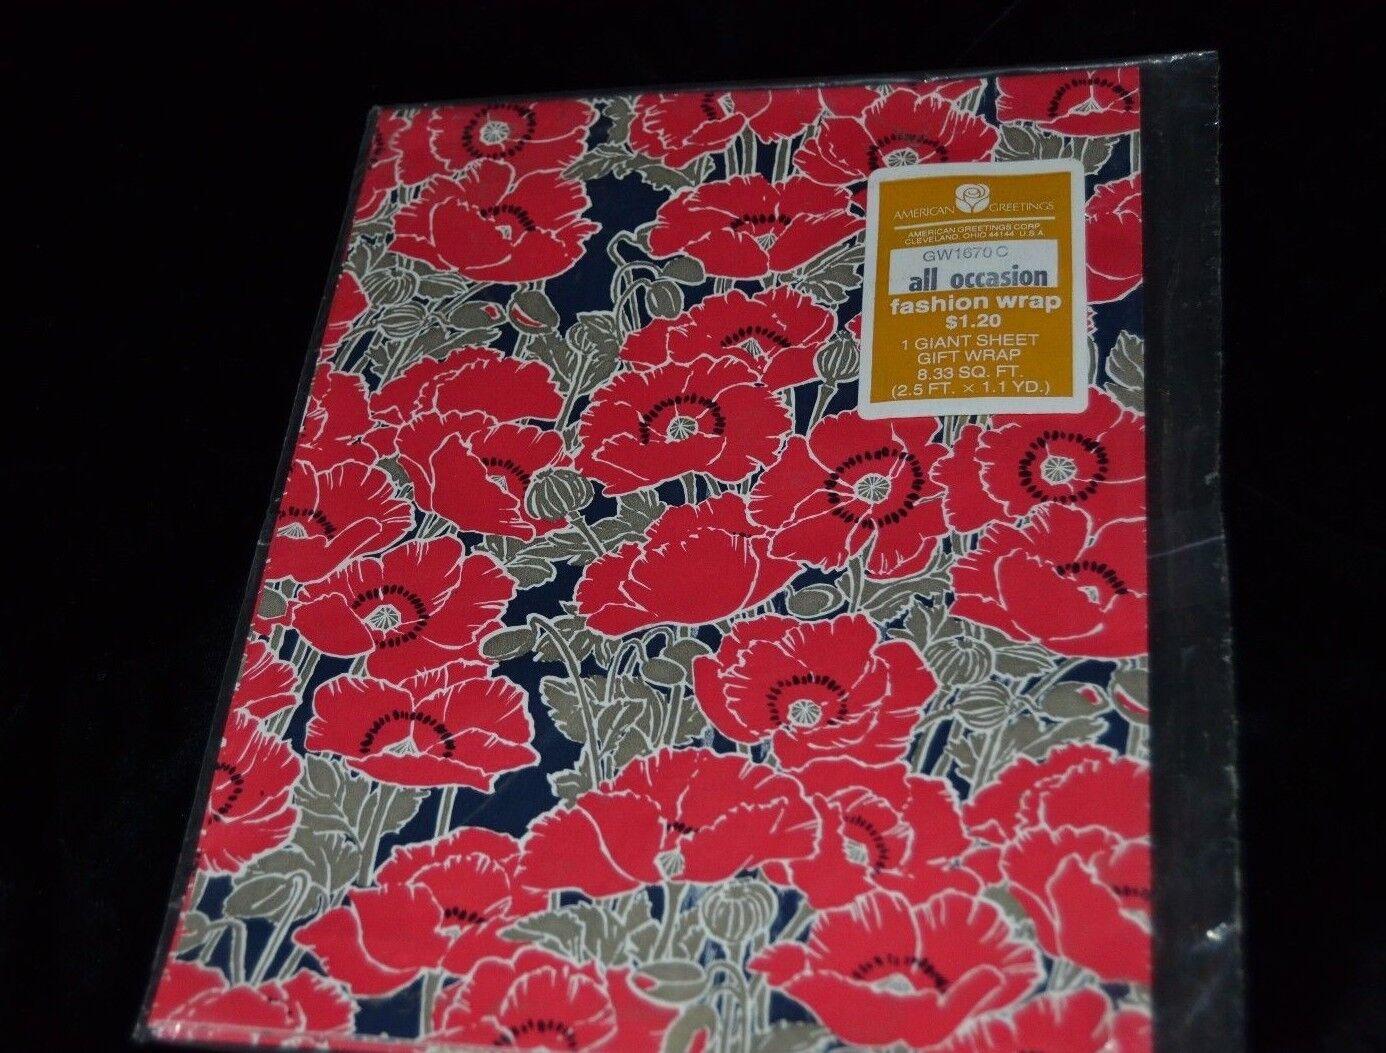 Vintage American Greetings Paper Gift Wrap Red Poppy Poppies Flowers